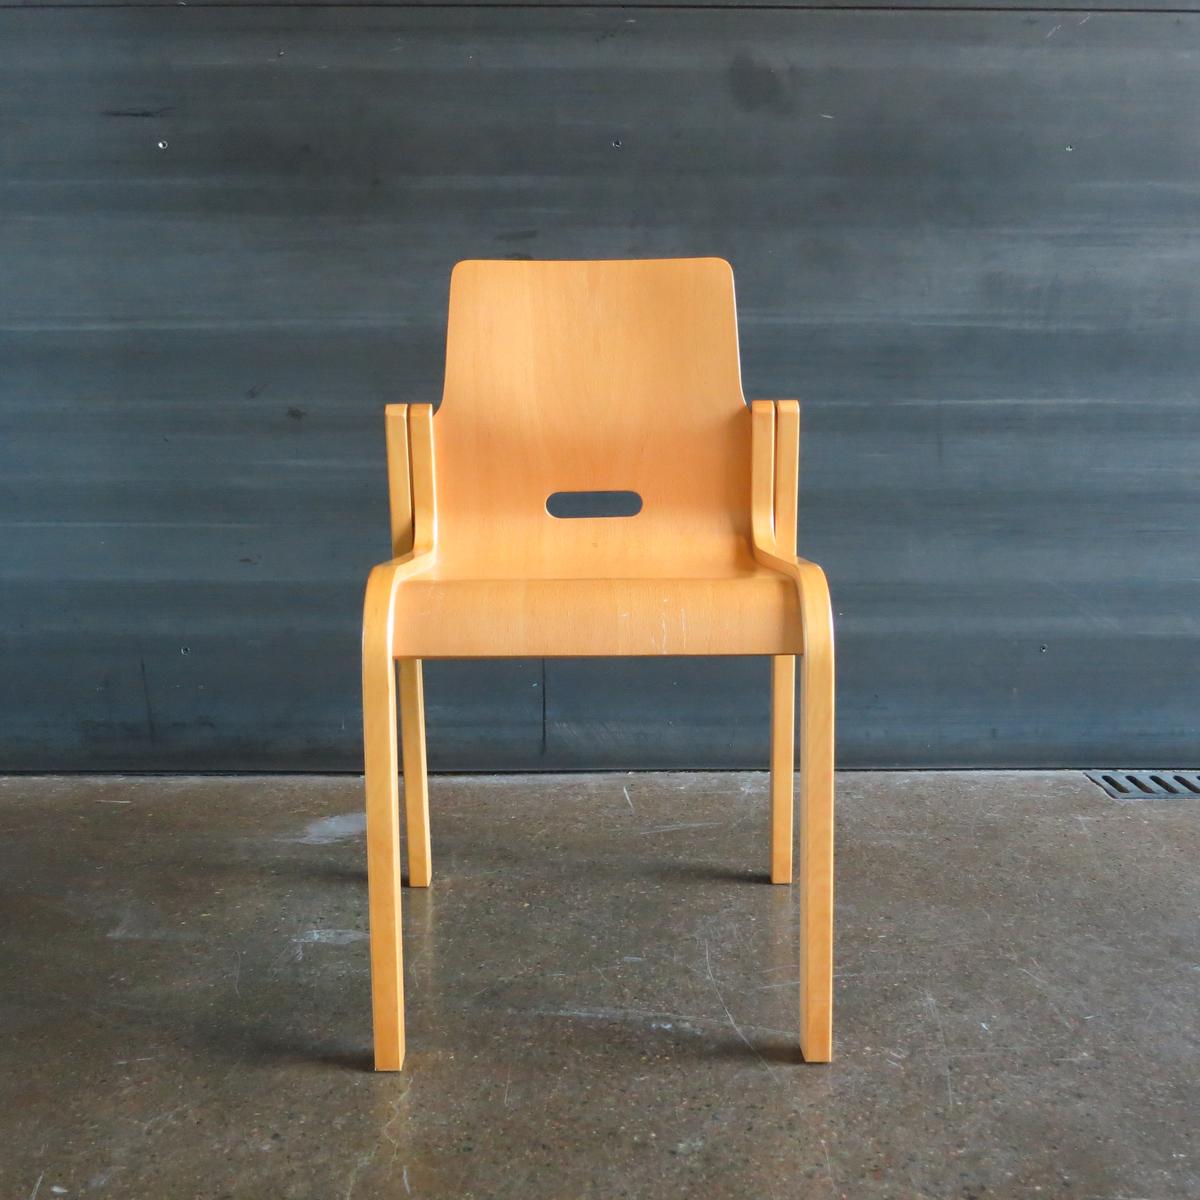 Our Kari 3 Chair, photo by Jennifer Wong